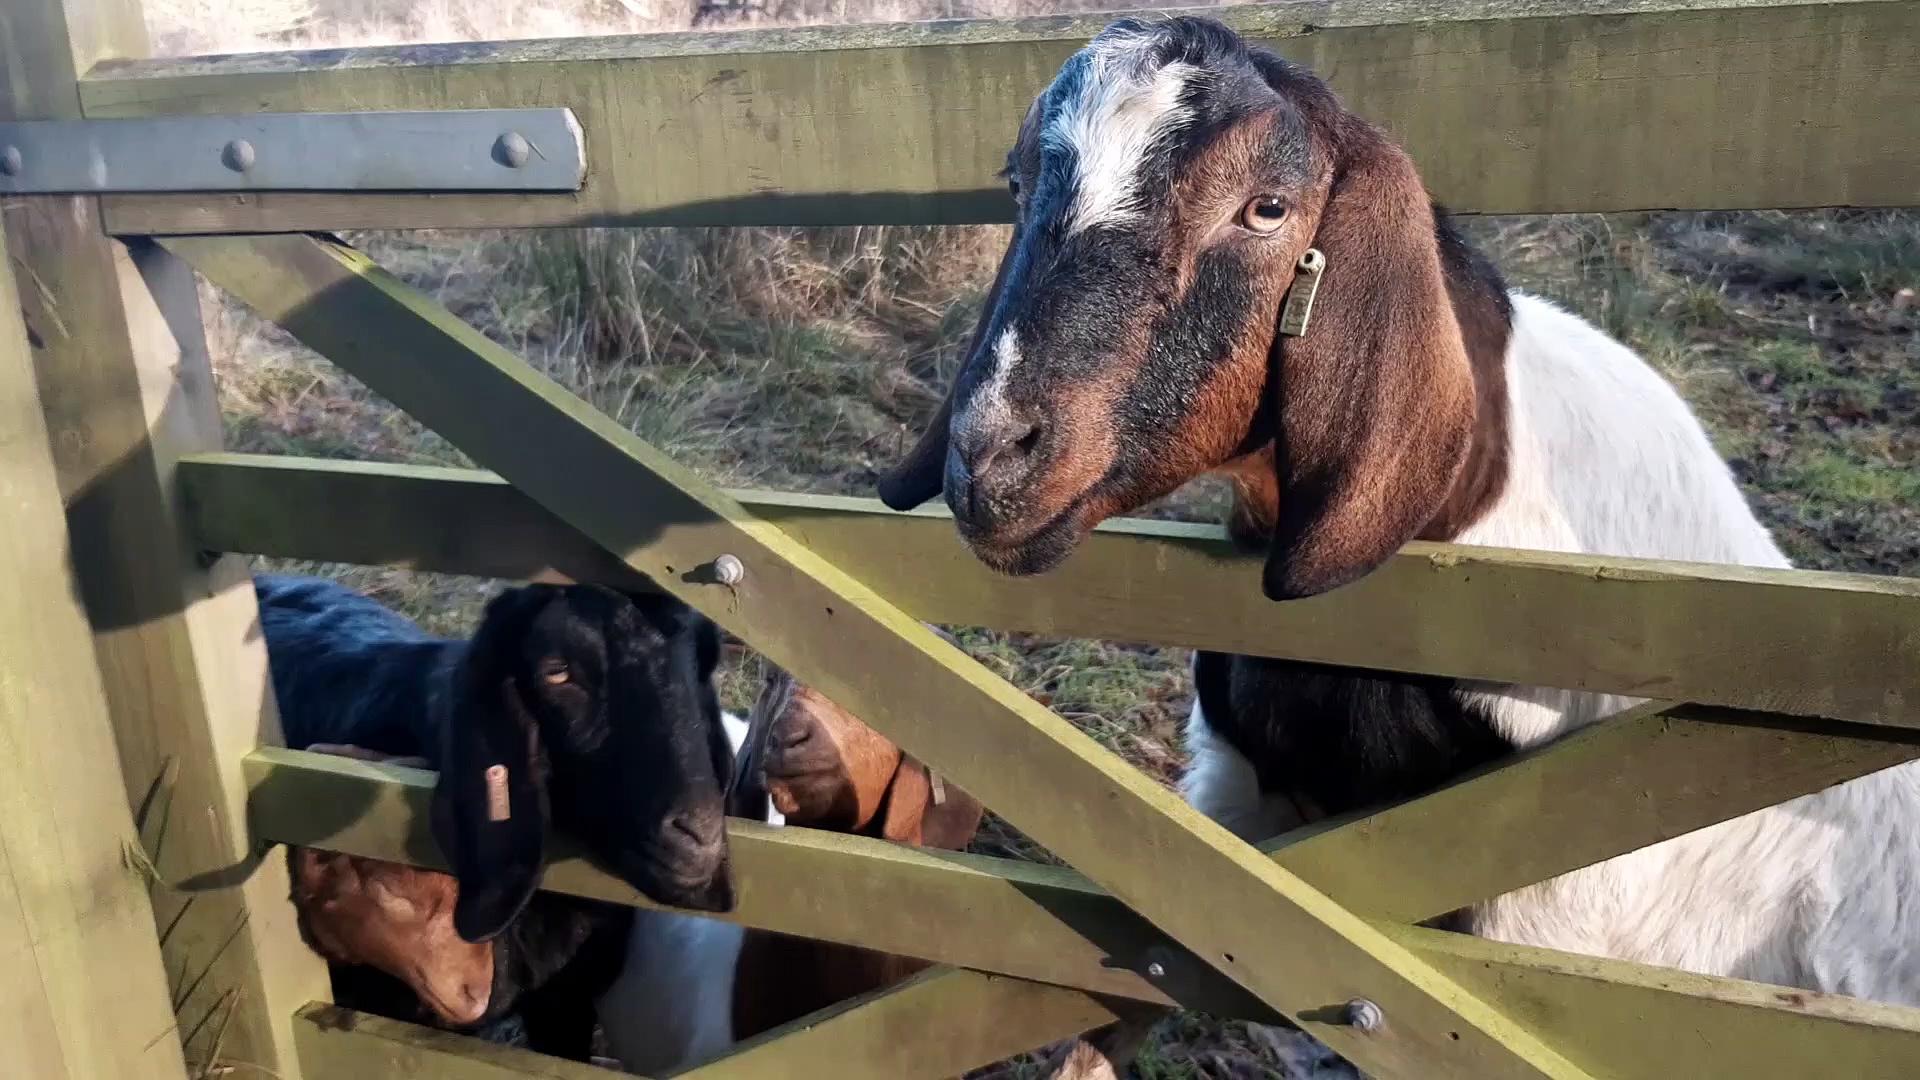 Tophill goats